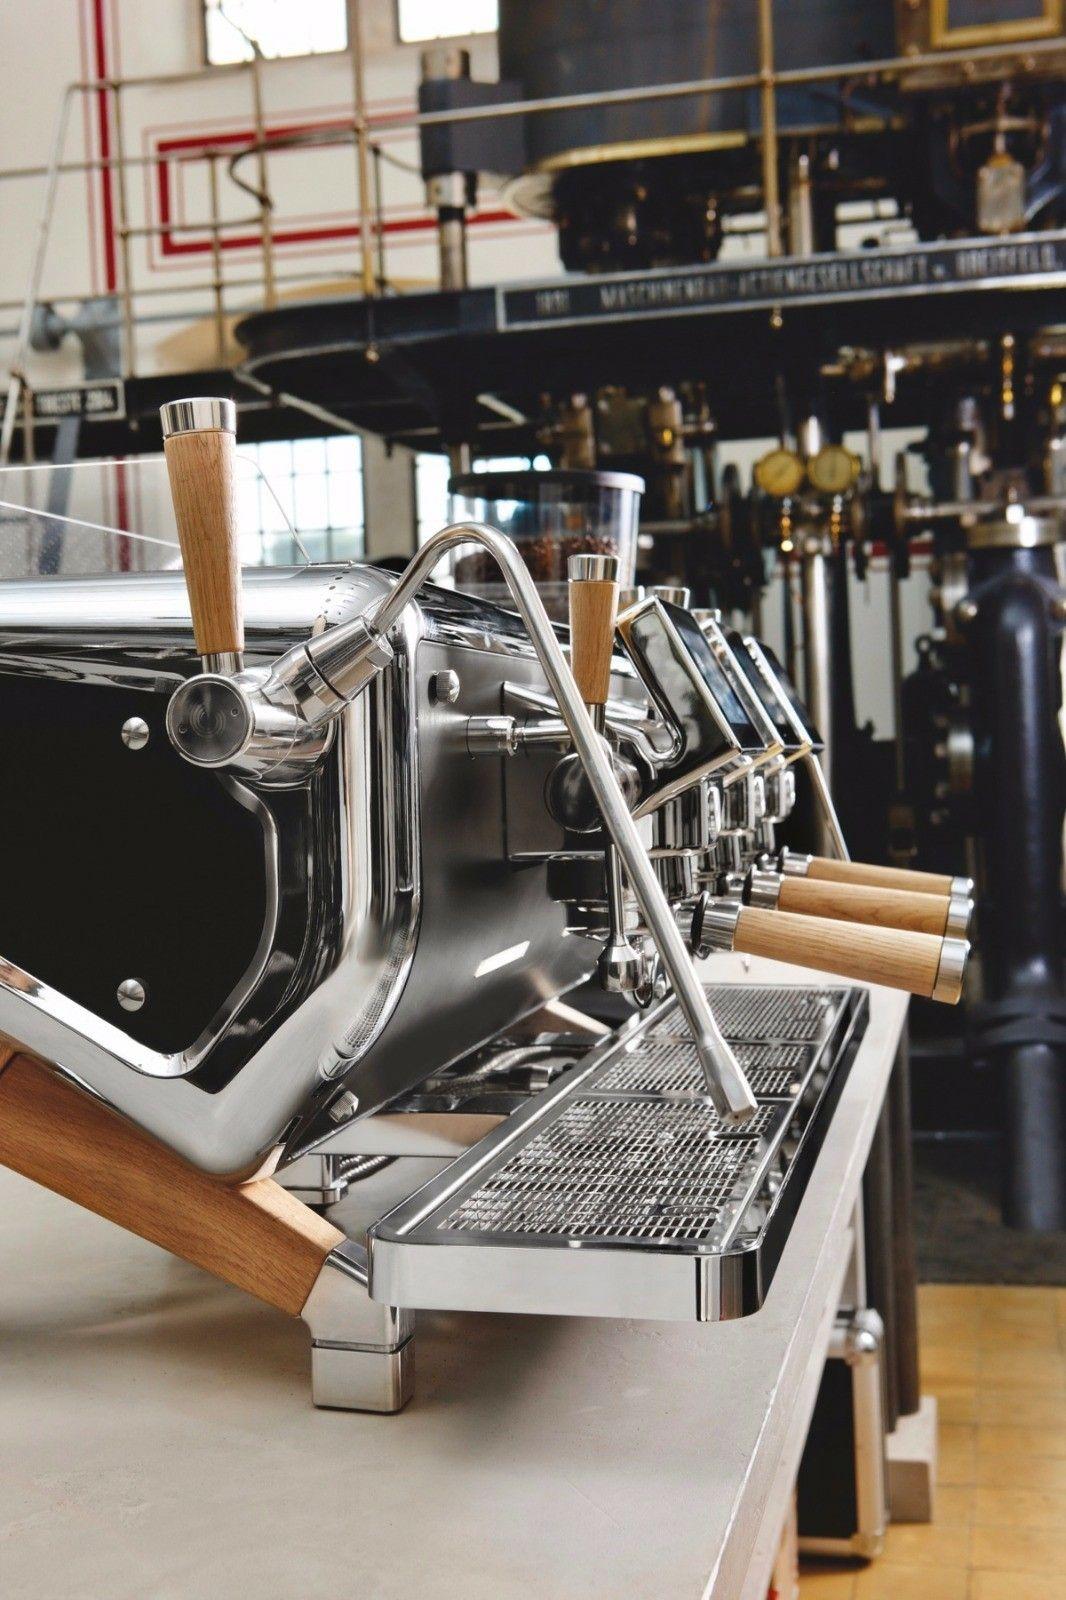 Pin by simo boljevic on espresso machines Espresso